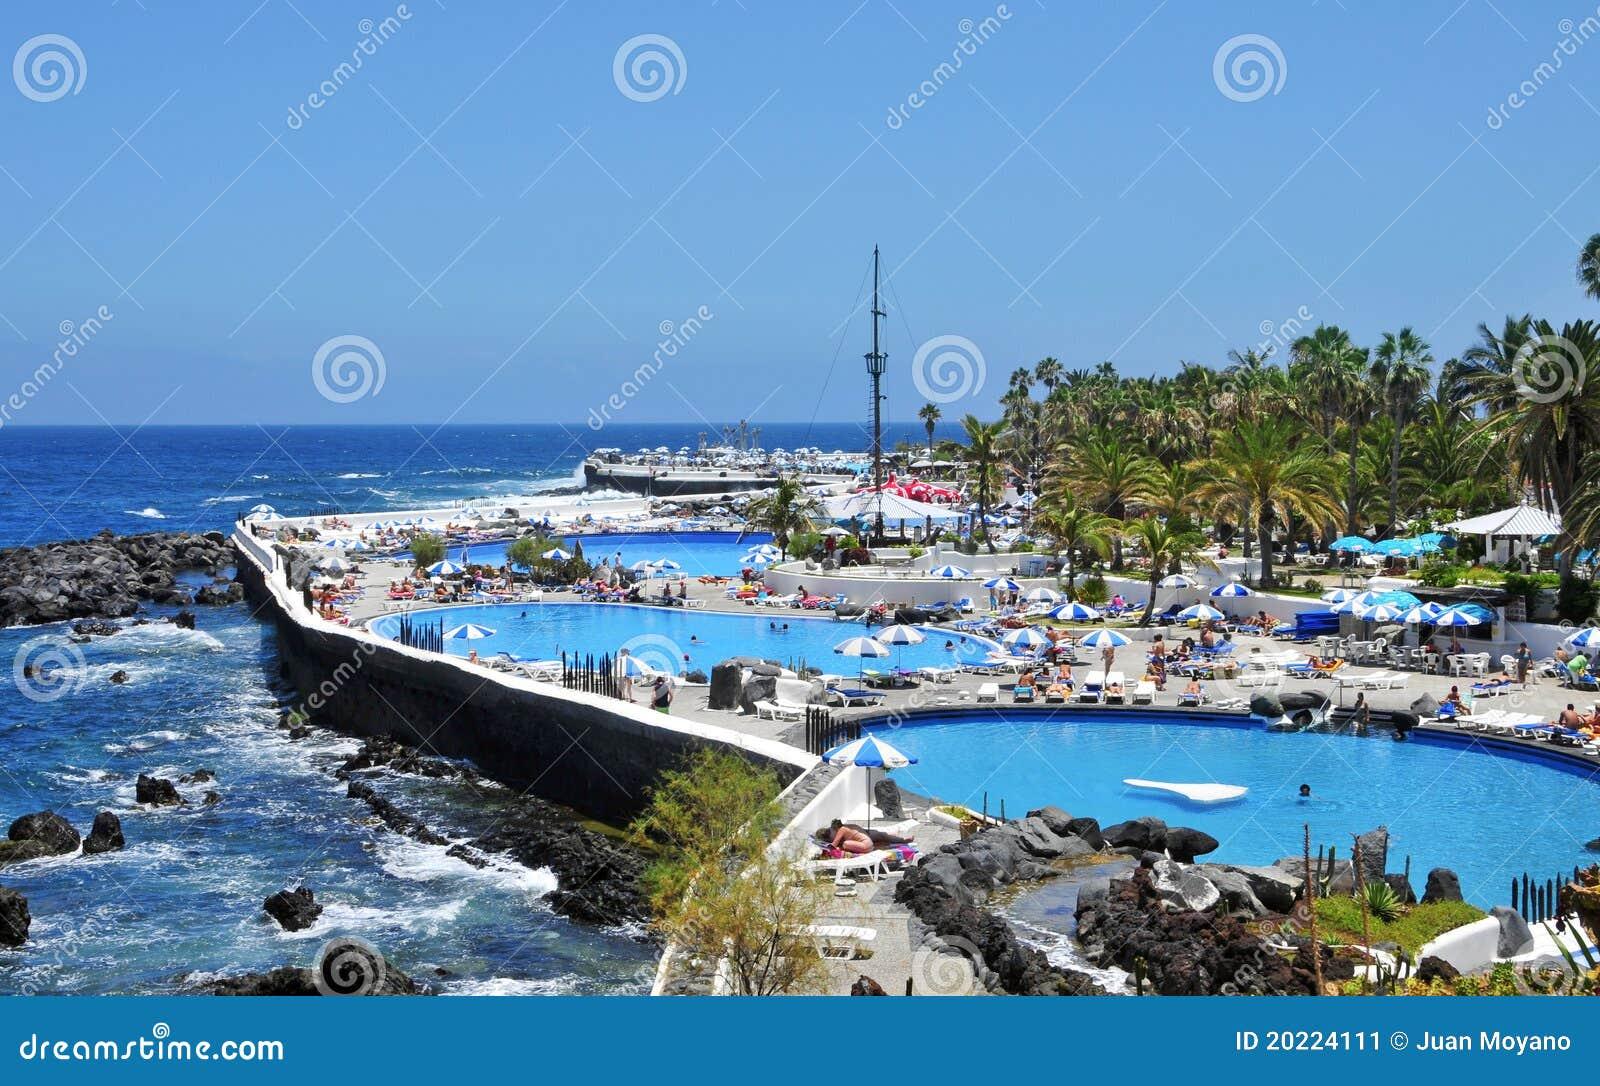 Lago martianez puerto de la cruz tenerife espa a foto for Piscinas martianez